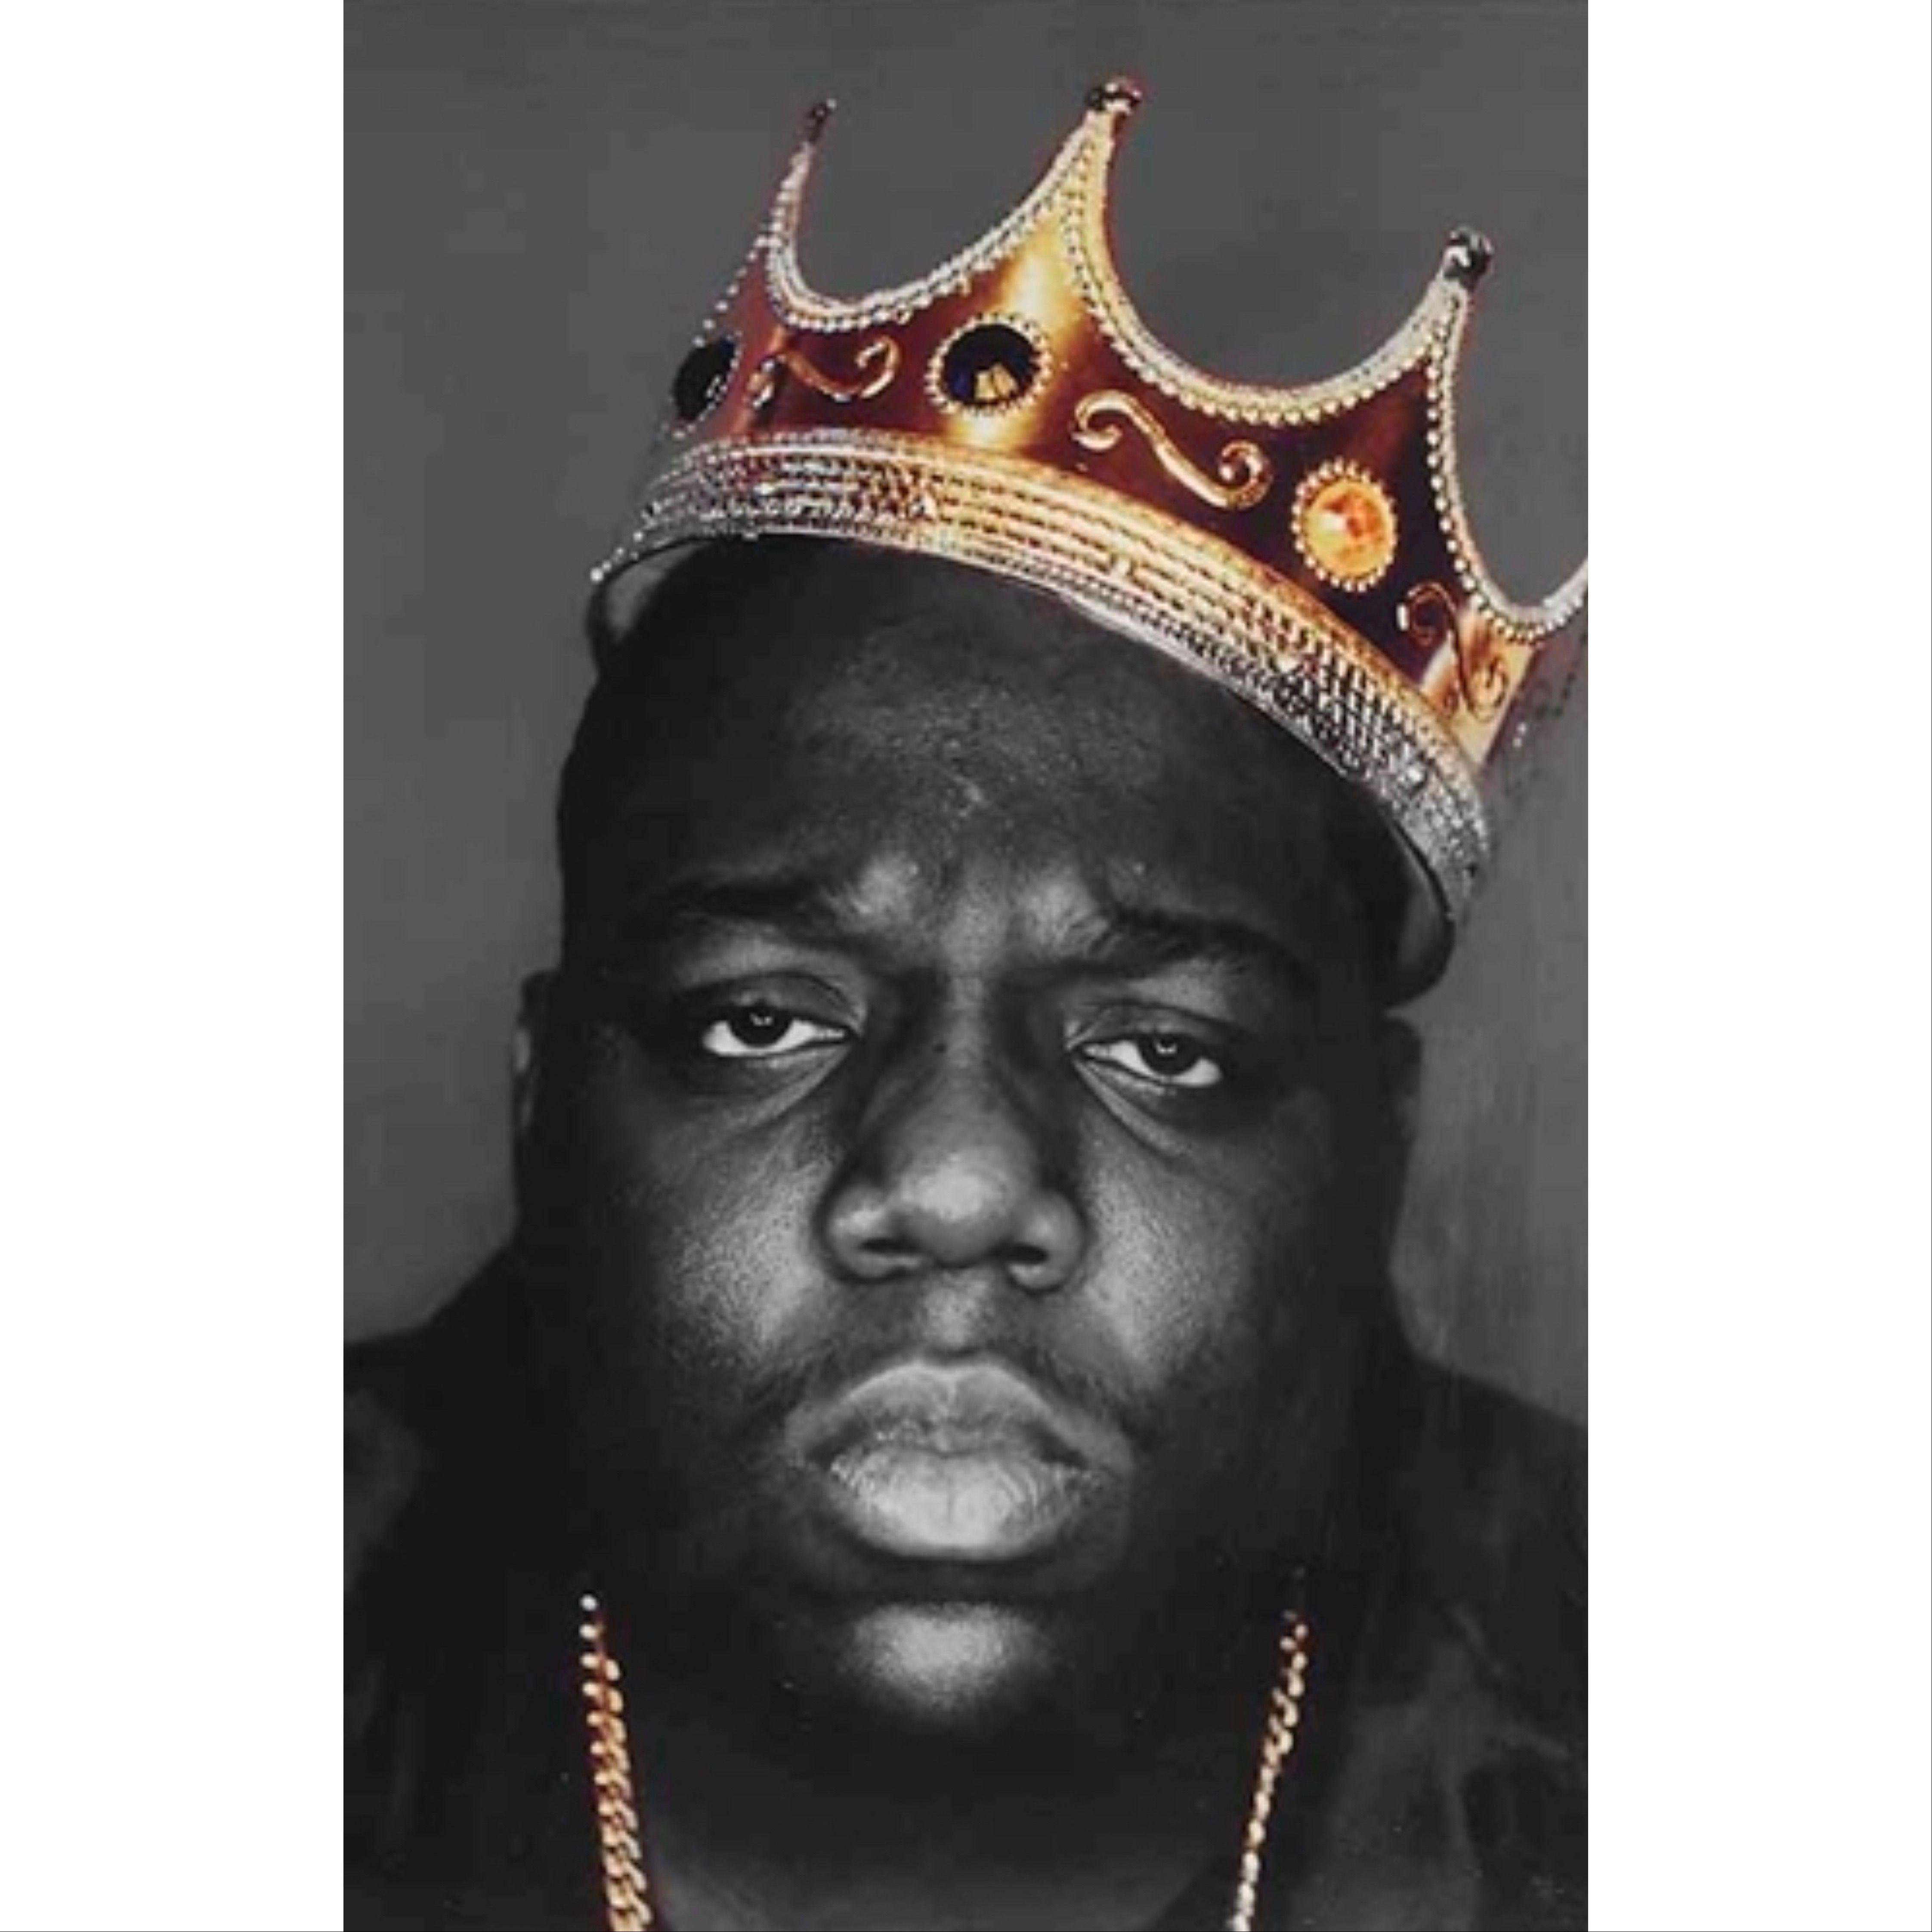 Notorious B I G Biggie Smalls Gold Crown Poster 24 X 36 Biggie Smalls Art Notorious Big Tattoo Biggie Smalls Poster #17 poster mural notorious big biggie smalls rap hip hop 40x40 inch (100x100 cm) 8mil paper. pinterest